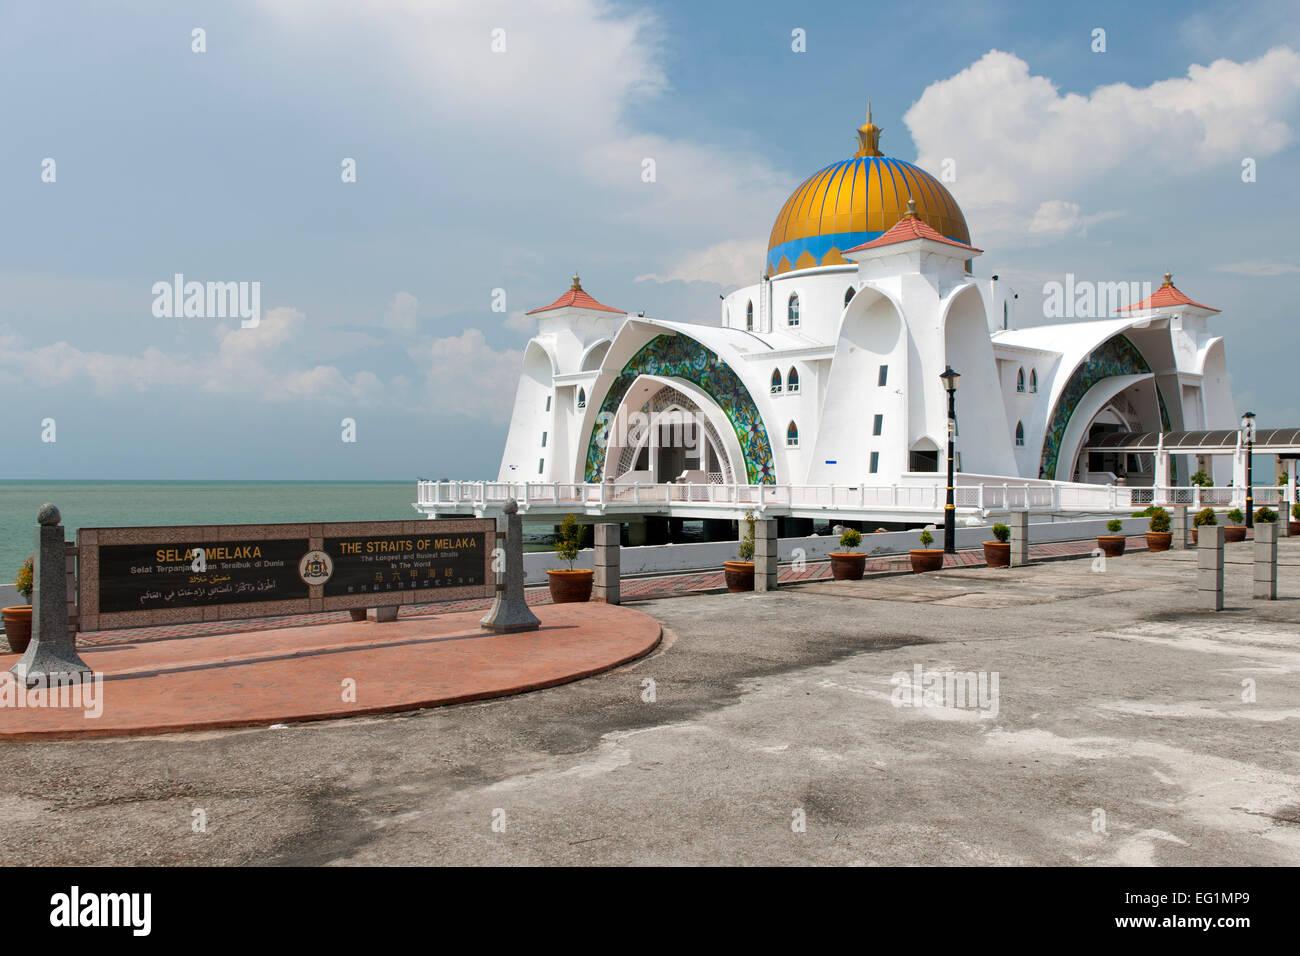 The Malacca Straits Mosque (aka Masjid Selat Melaka) in Malacca, Malaysia. - Stock Image